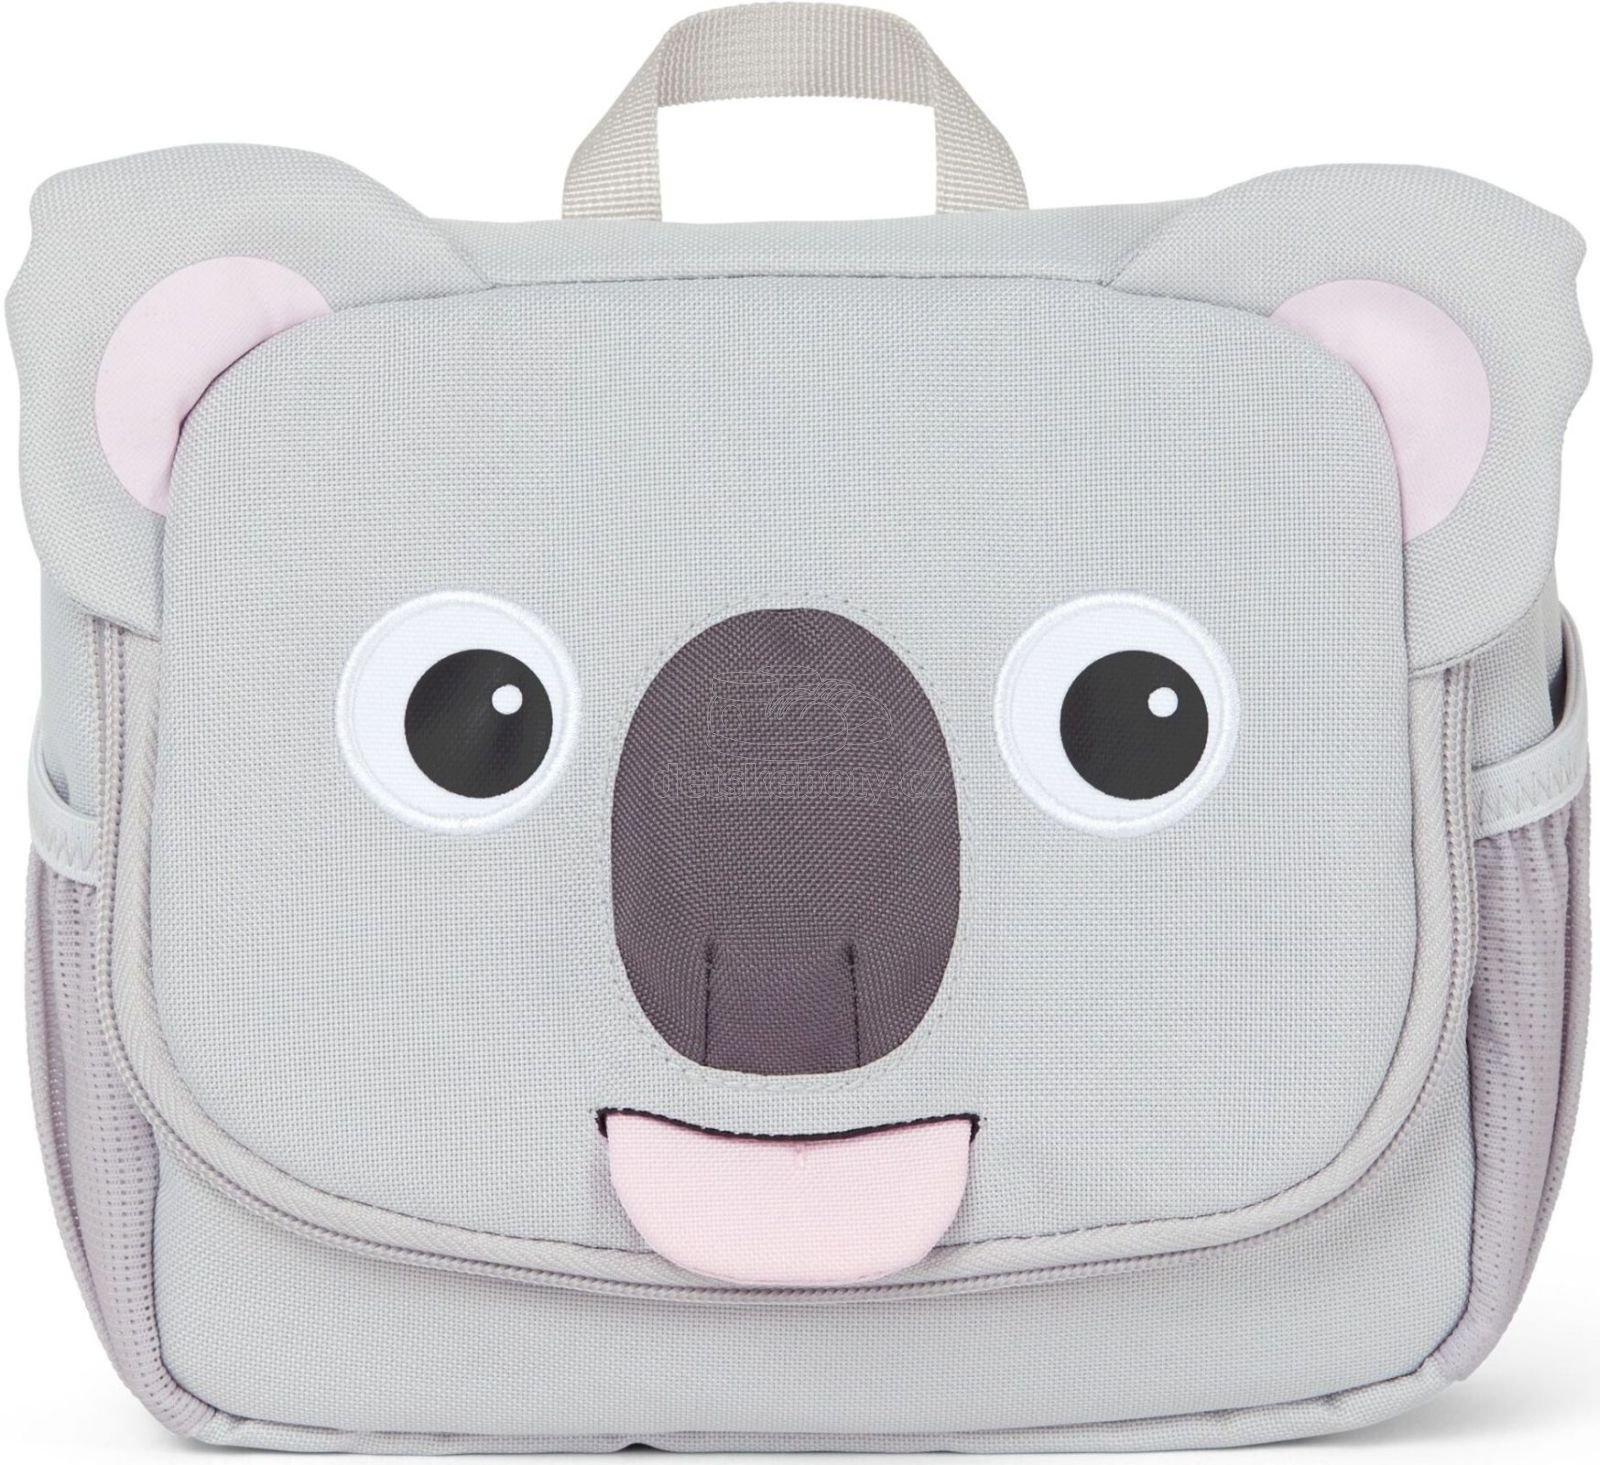 Gyerek kozmetikai táska Affenzahn Washbag - Koala Karla - grey